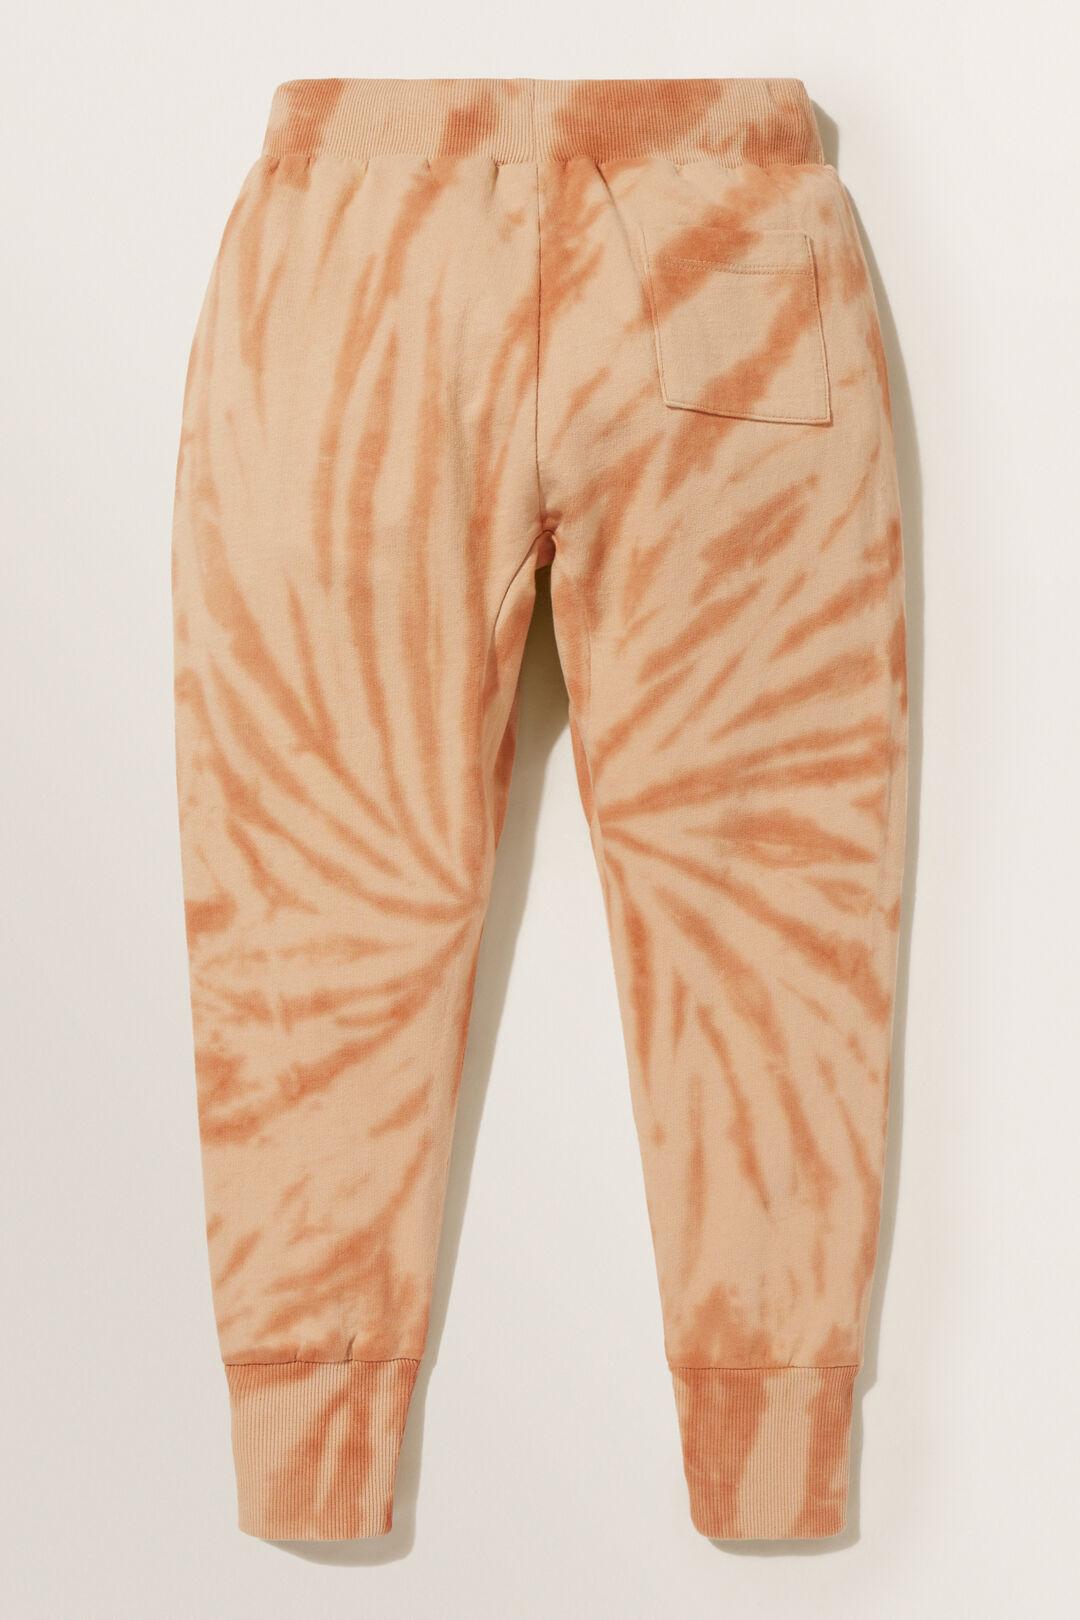 Tie-Dye Trackpants  Amber  hi-res